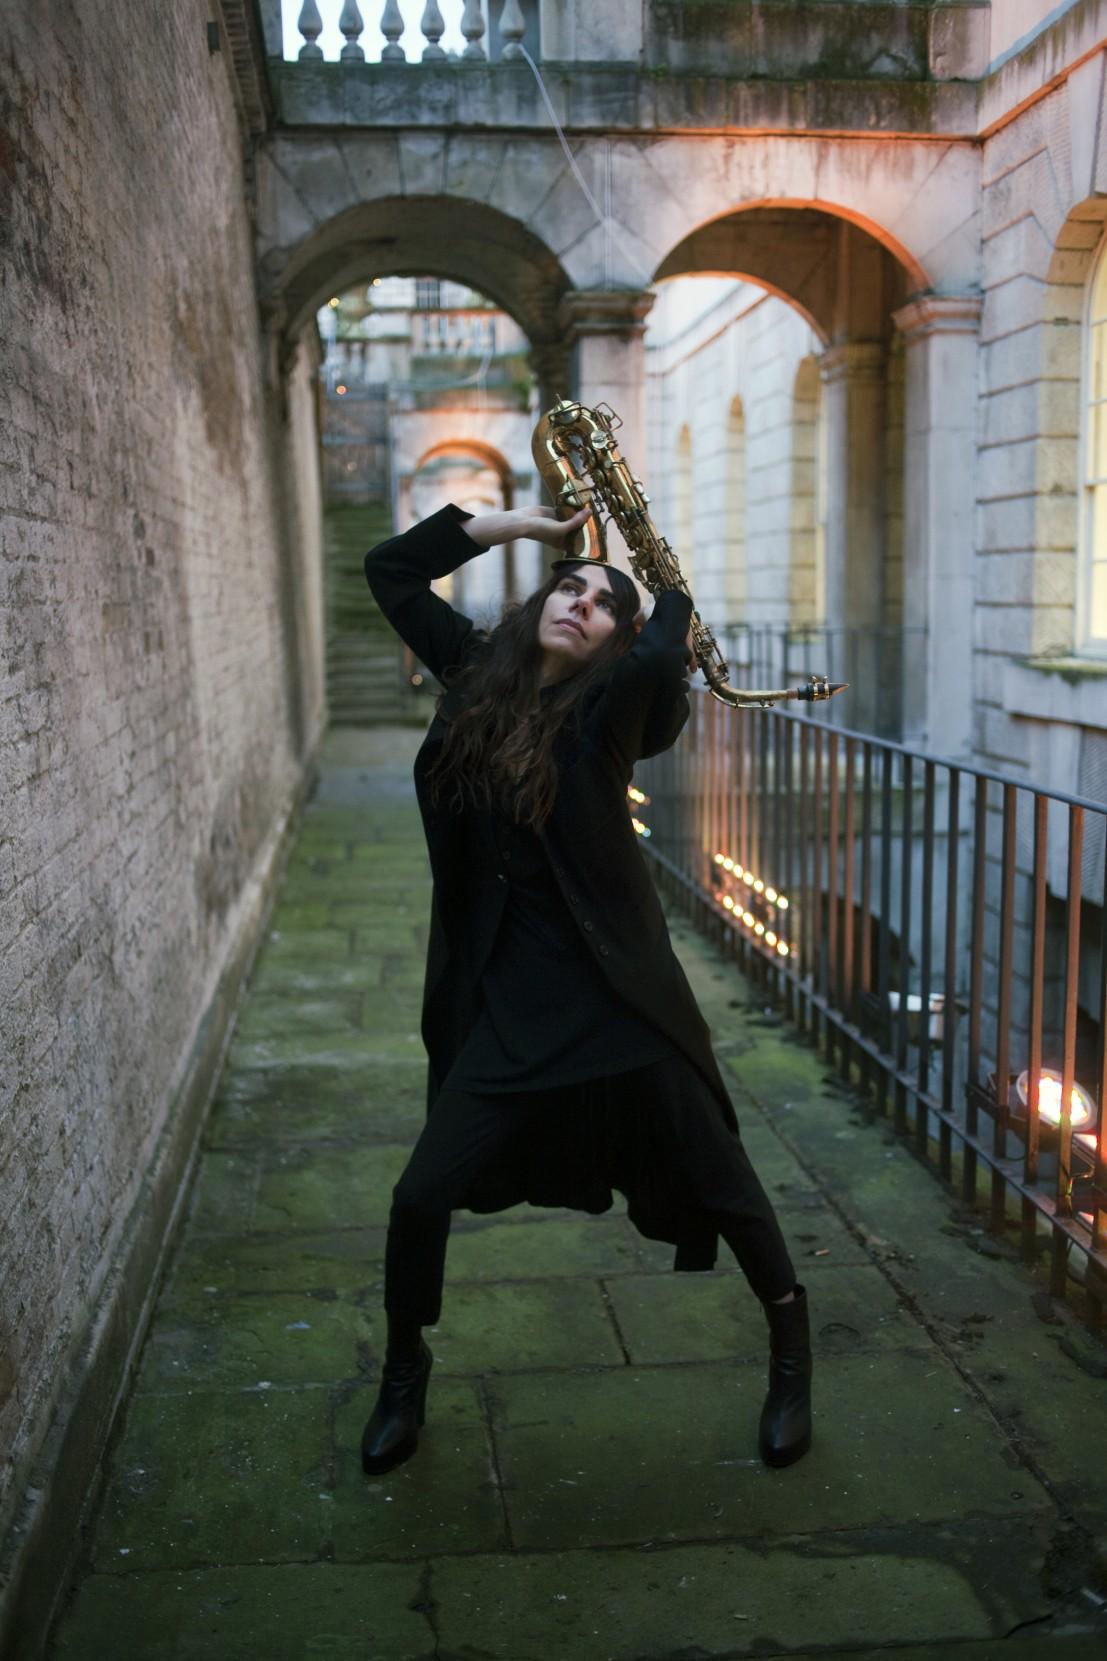 Pj Harvey Recording In Progress At Somerset House 2015